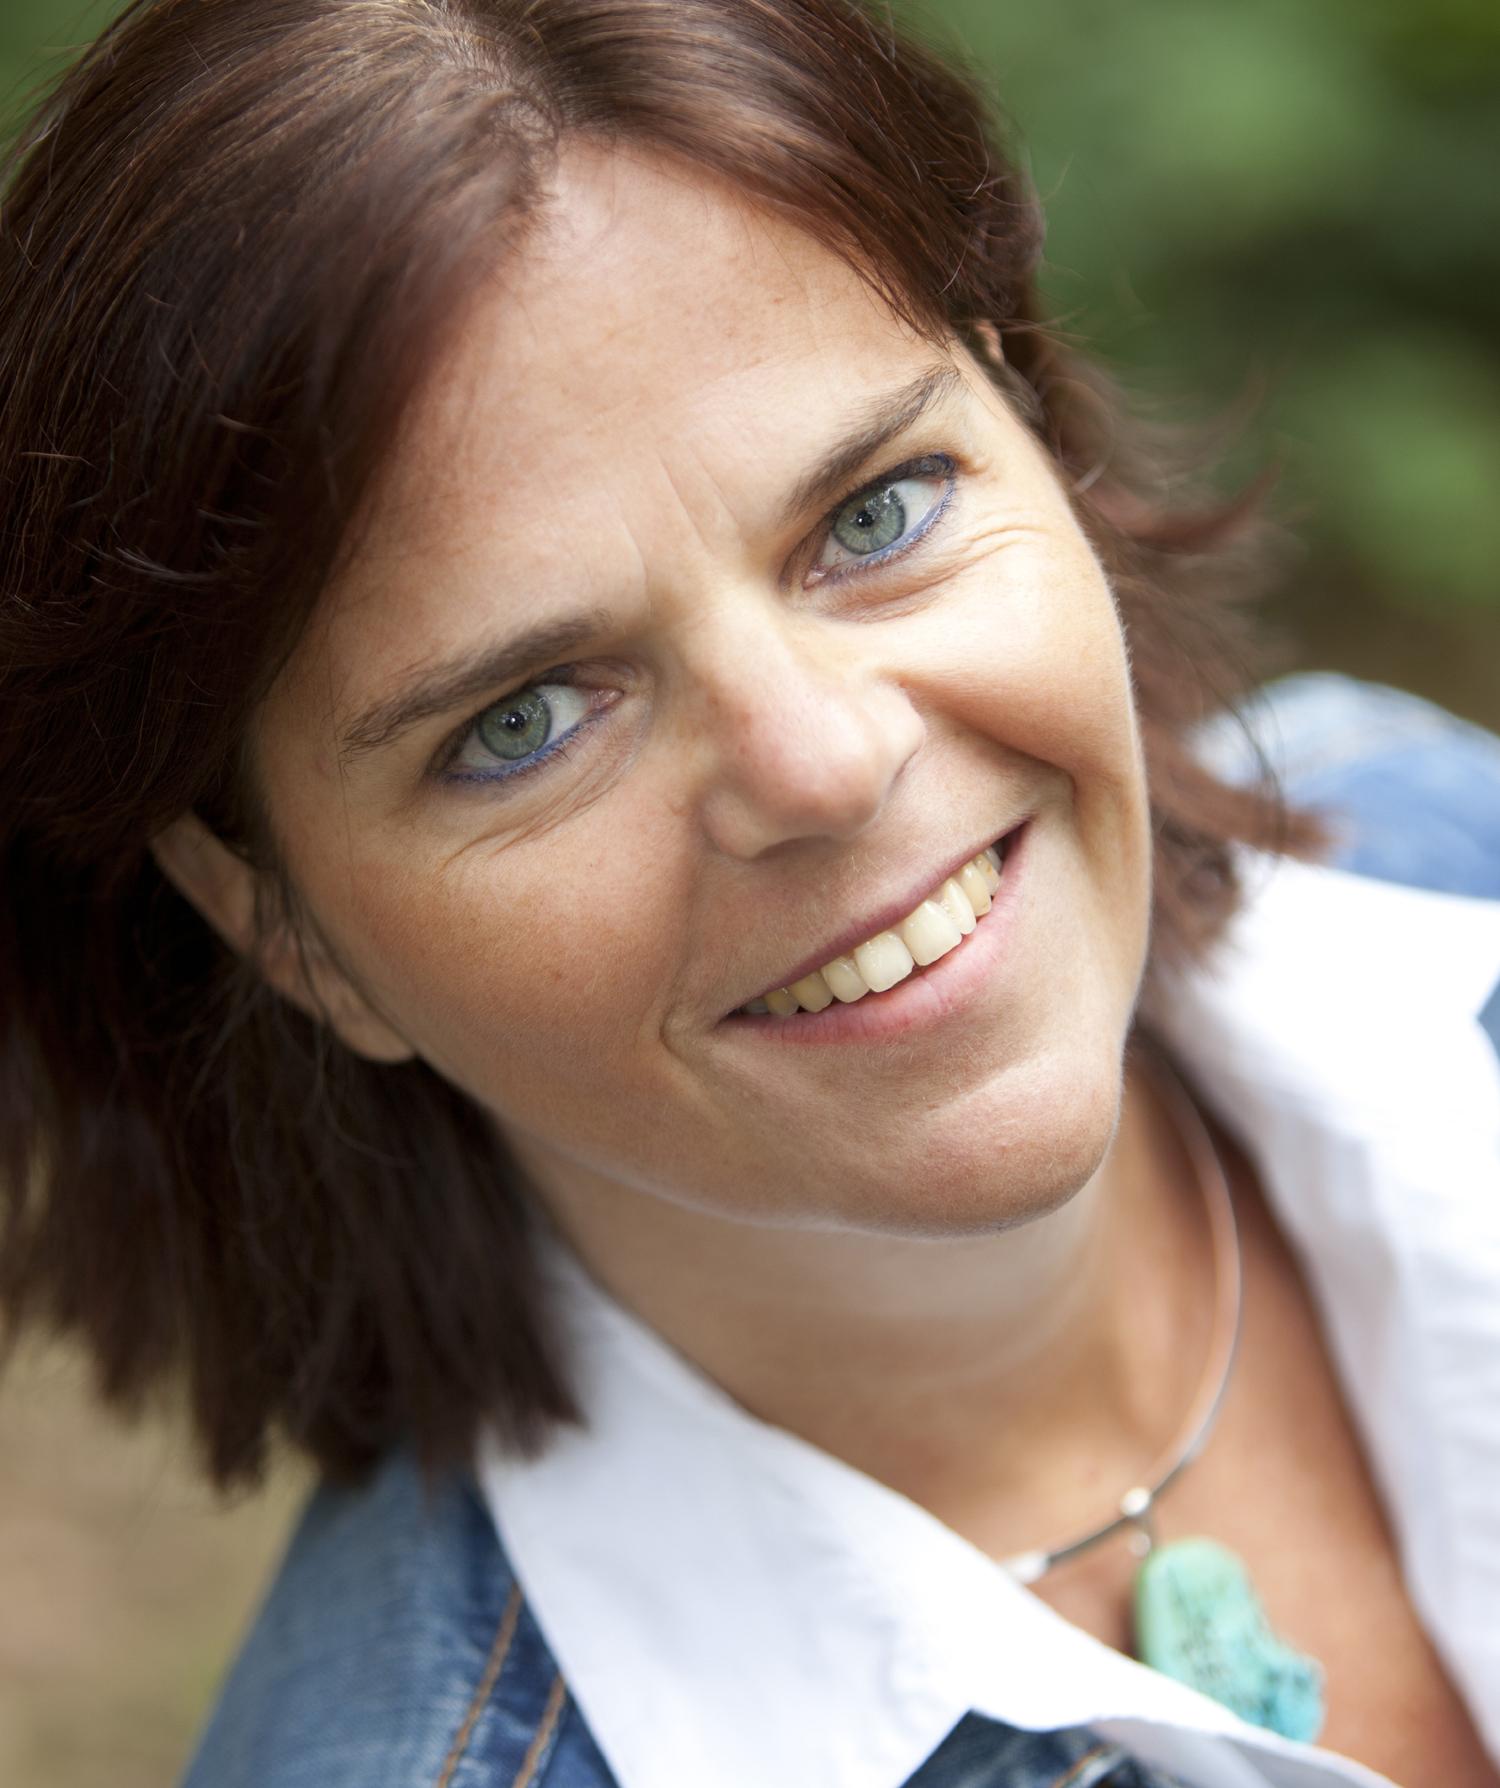 Karin_Janssen